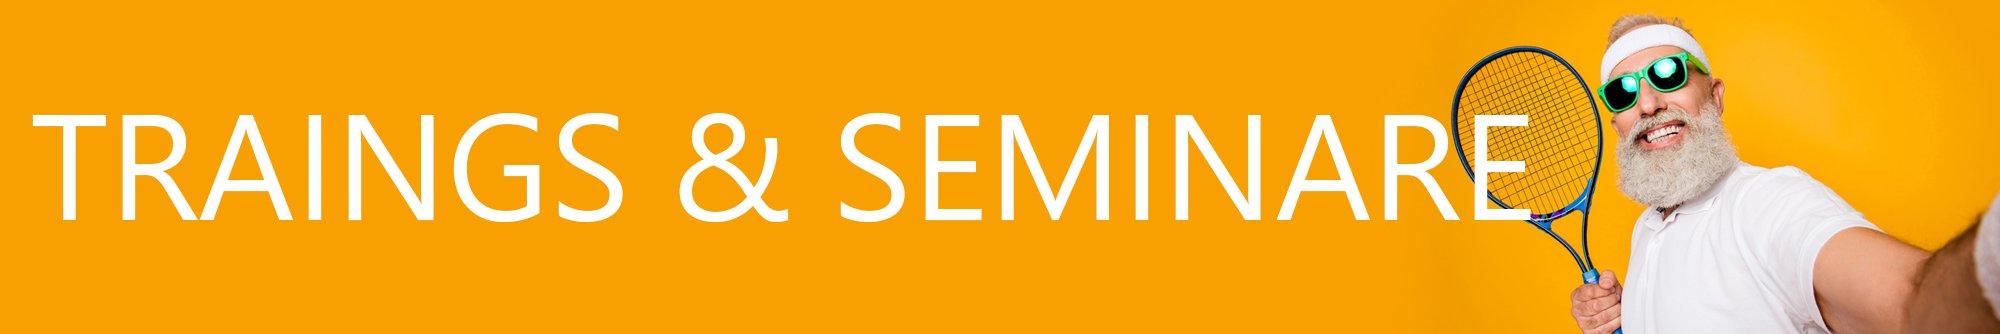 Trainings & Seminare